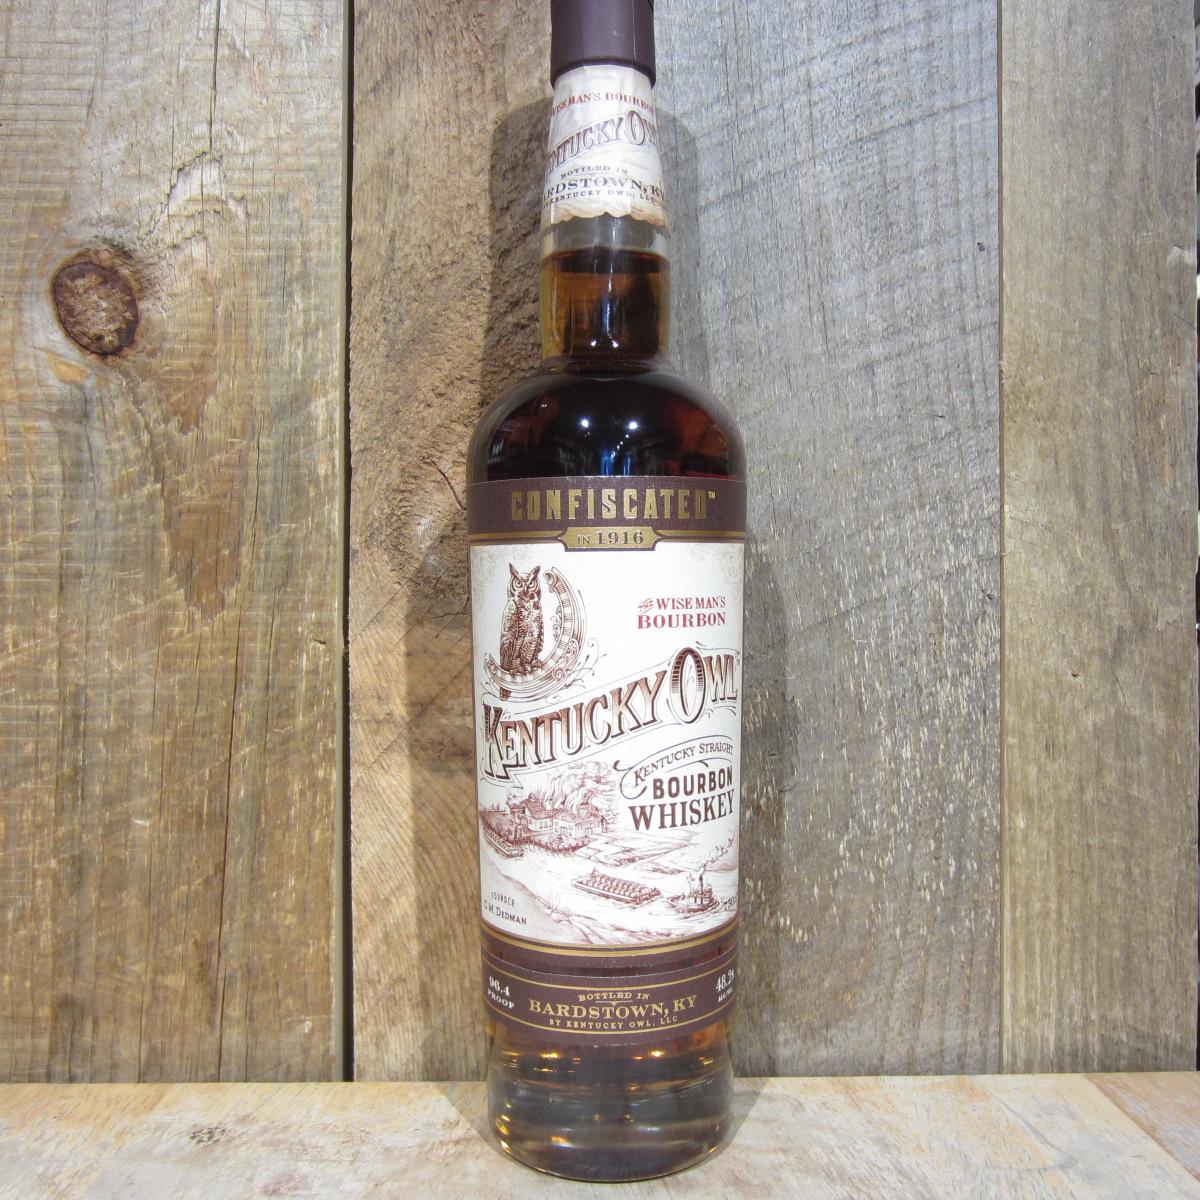 Kentucky Owl Confiscated Bourbon 750ml